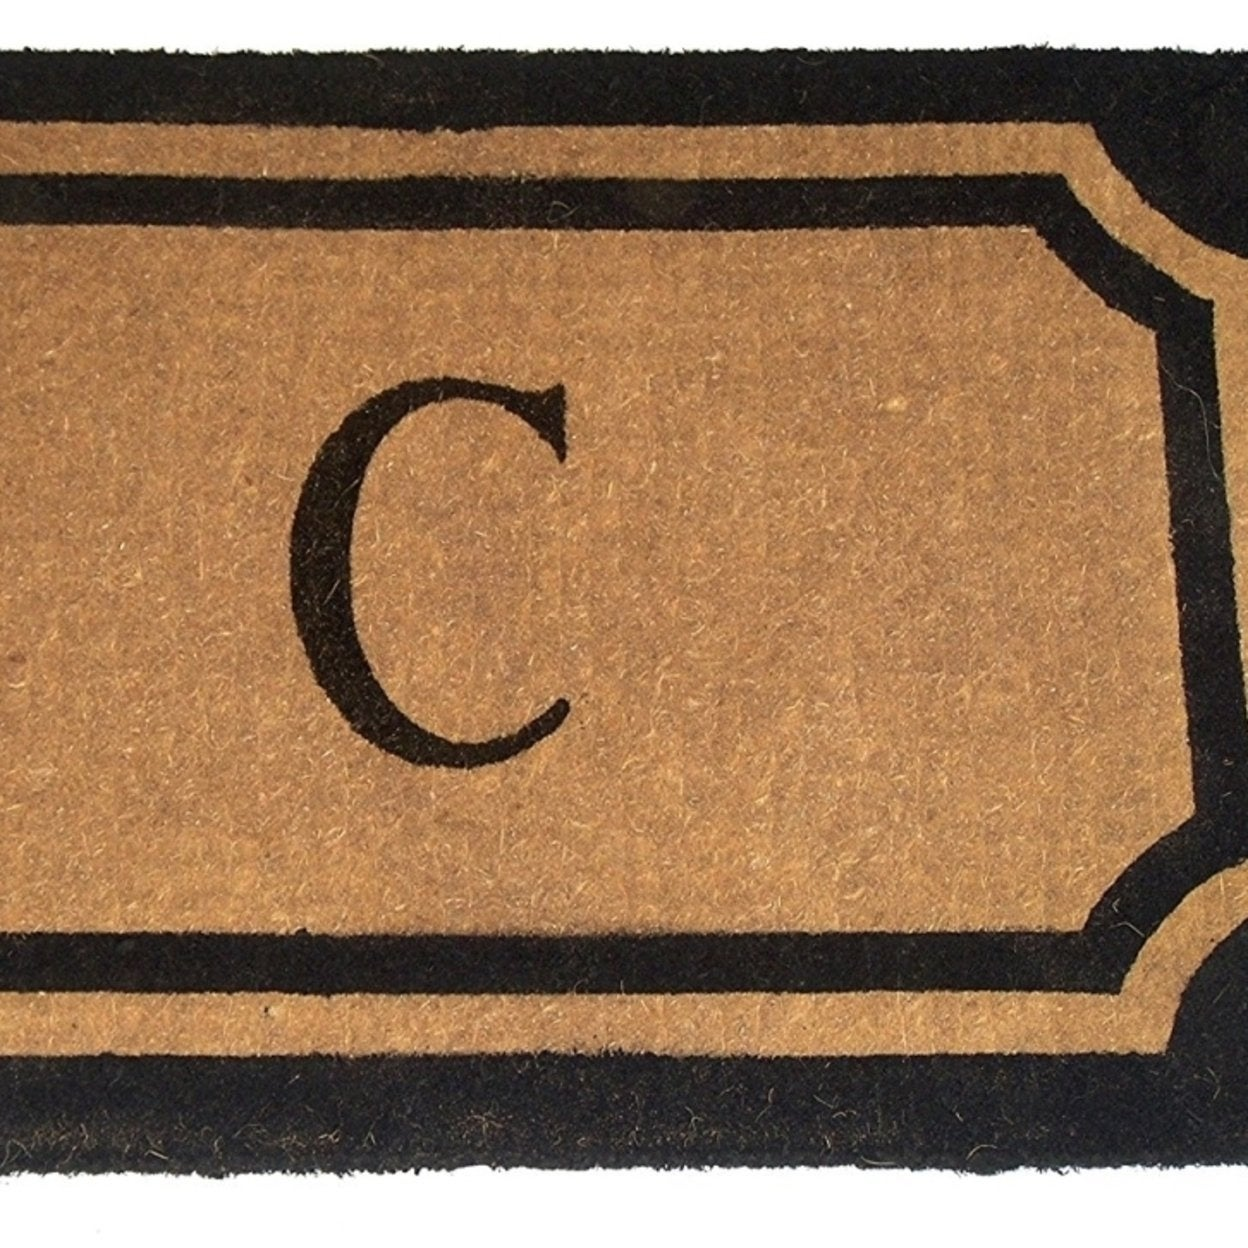 Geo Crafts G235 30 Blk 18 X In Imperial Wilkinson Doormat C Monogram Black